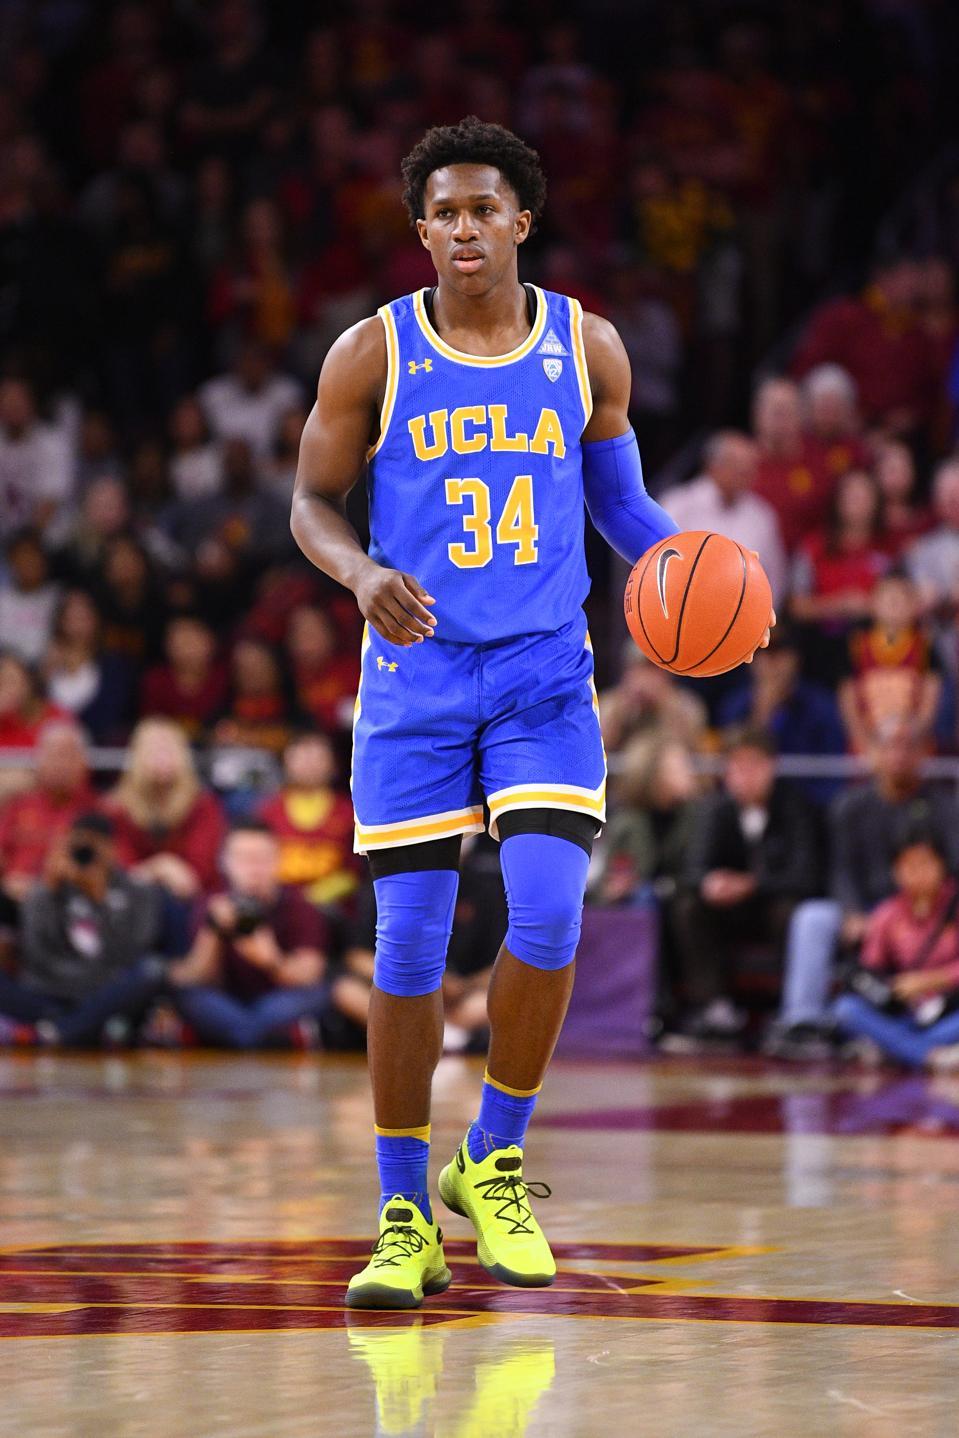 COLLEGE BASKETBALL: MAR 07 UCLA at USC